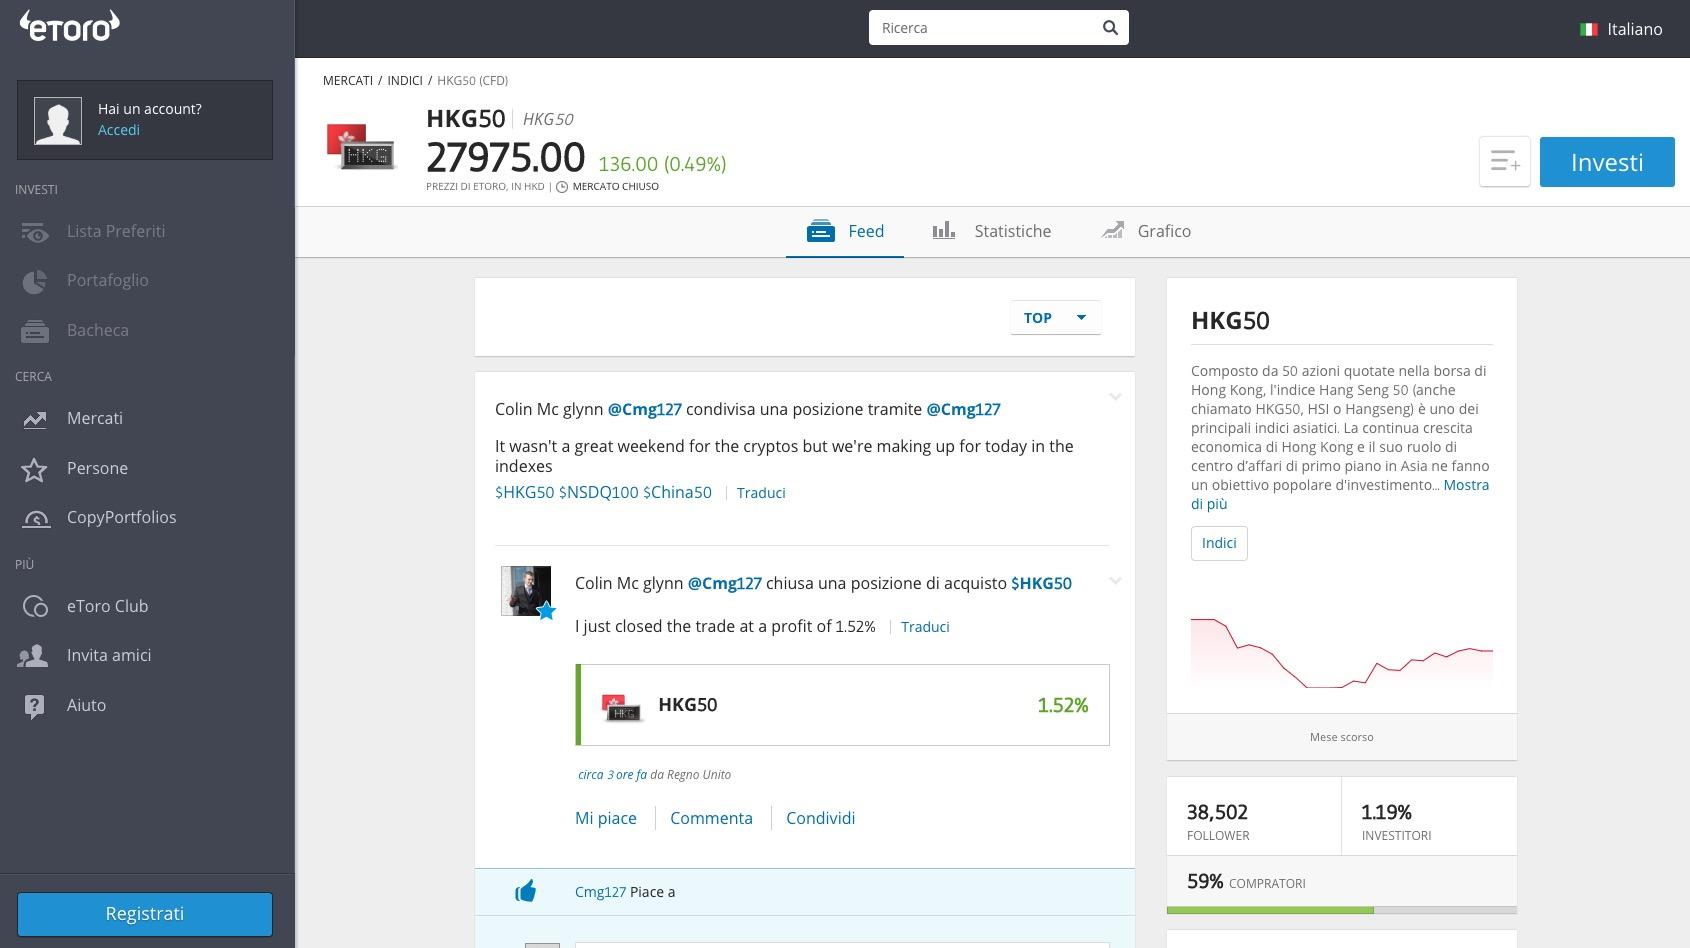 Investire nell'Indice Hang Seng con eToro